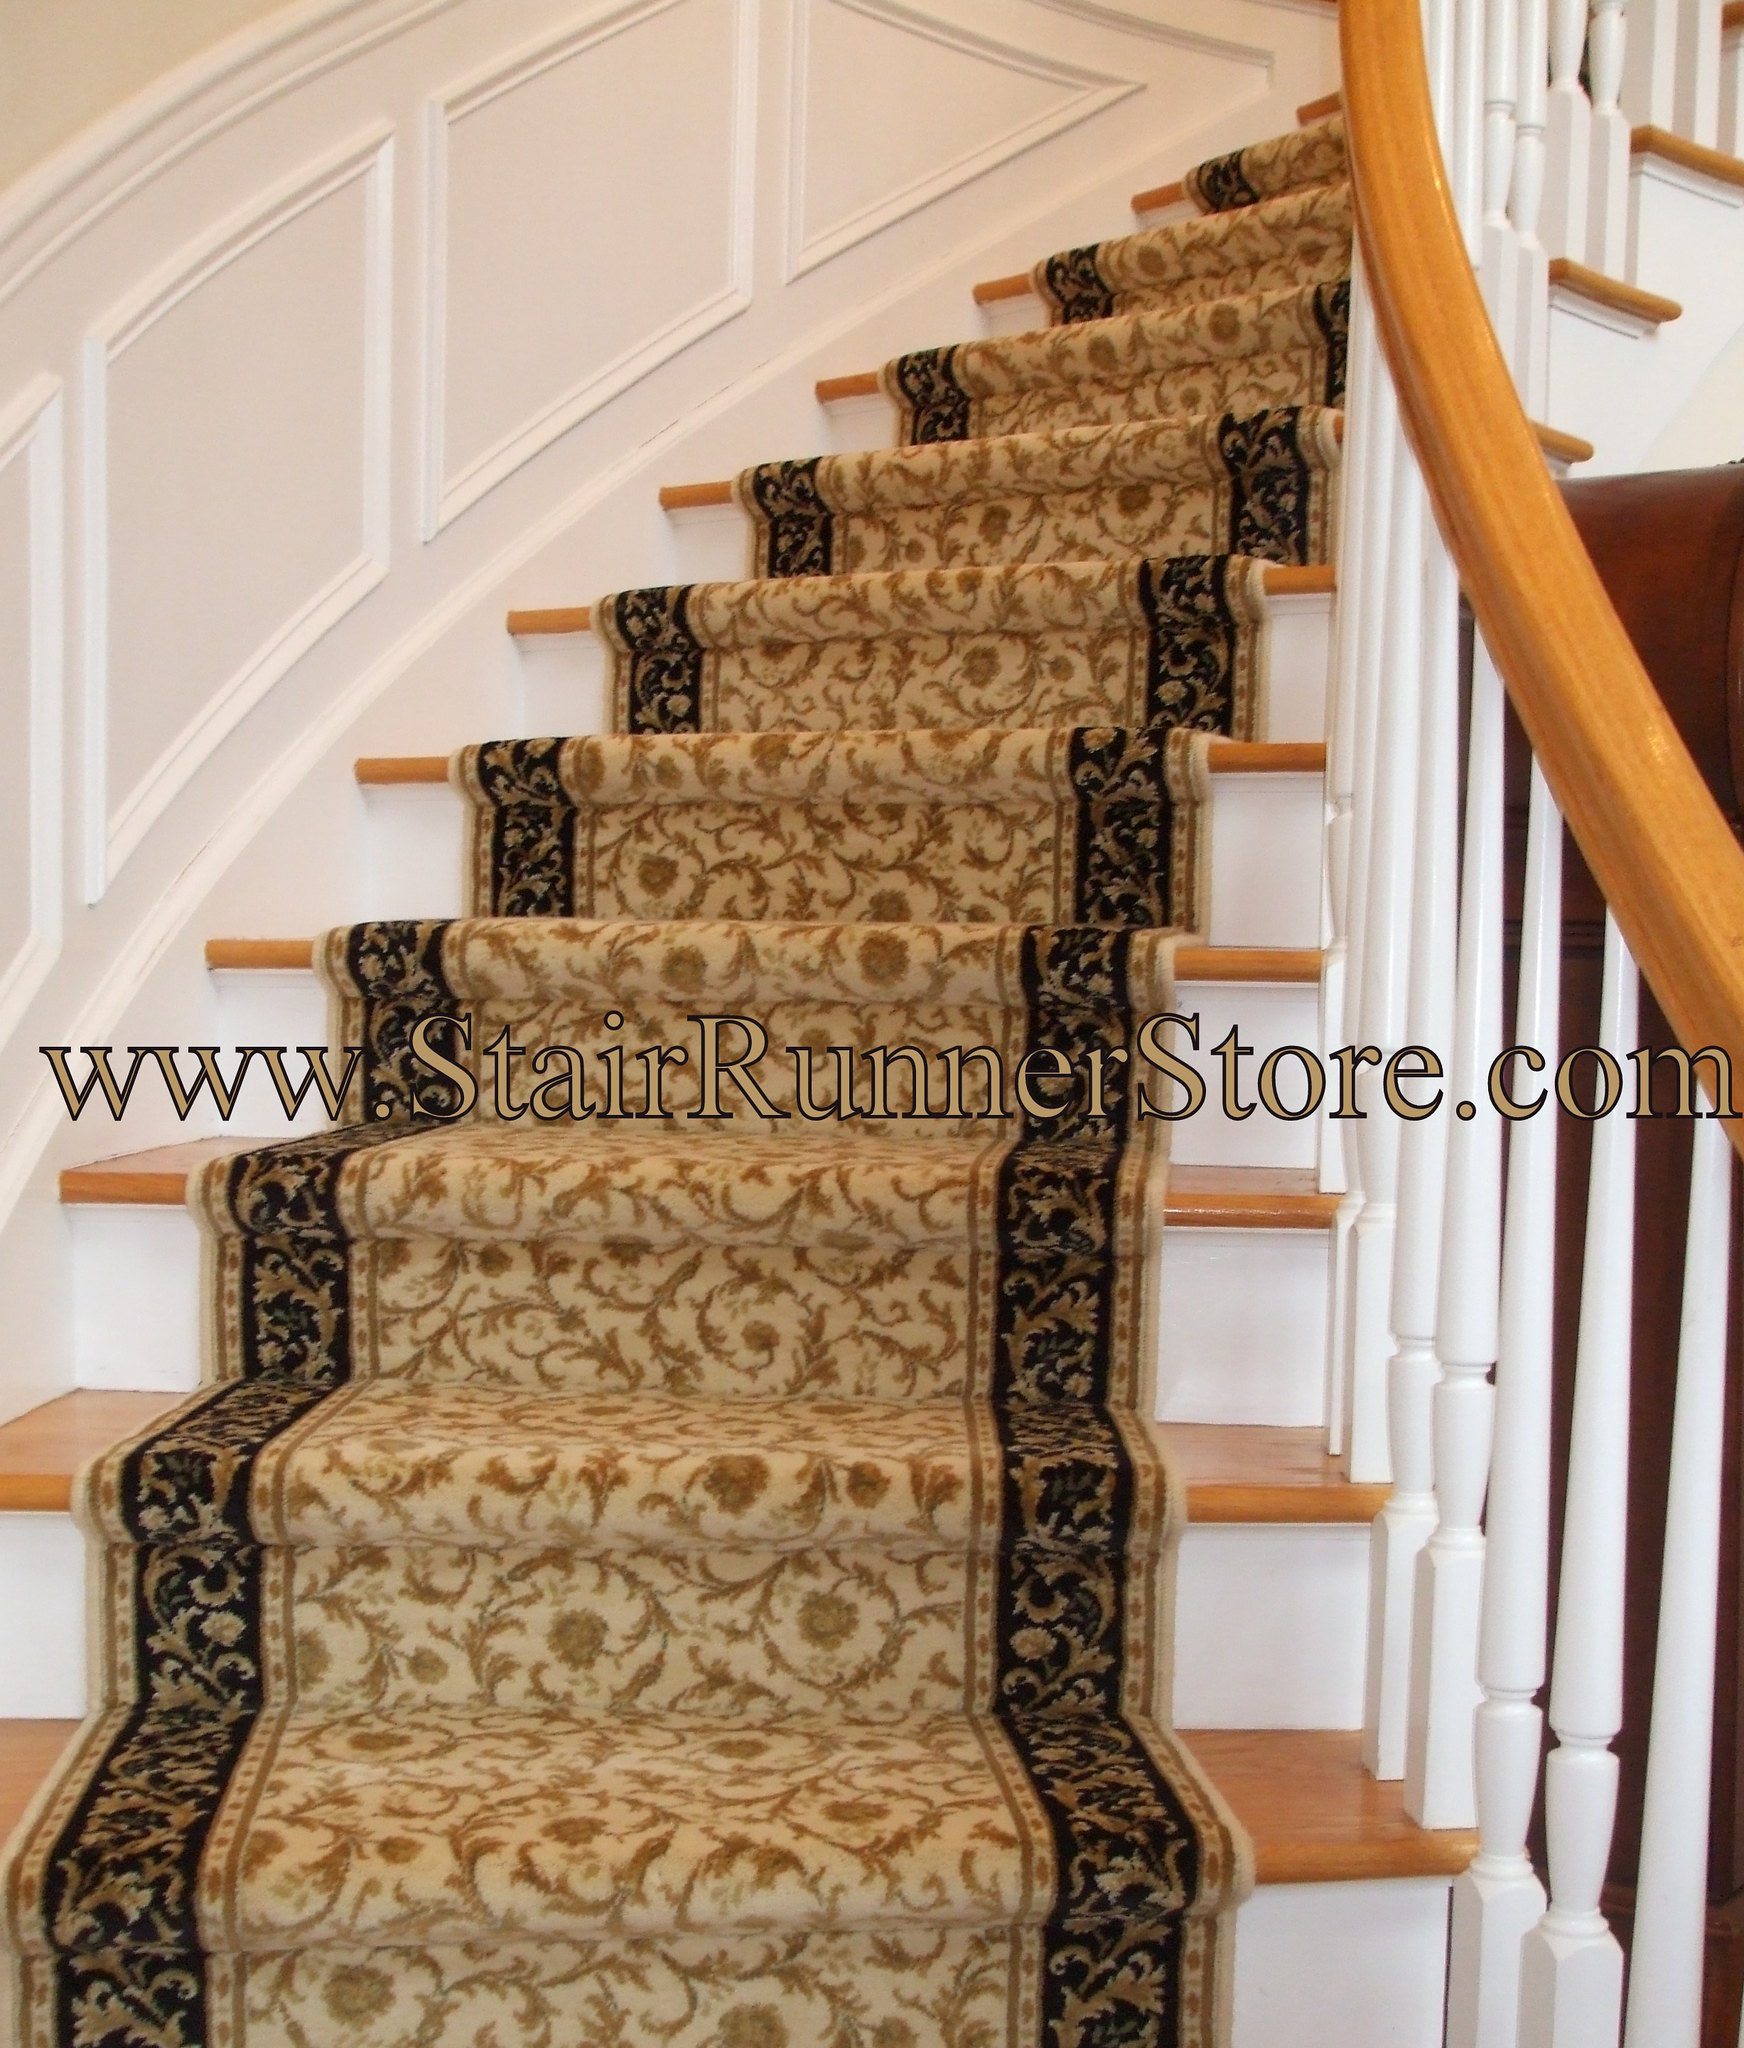 Merveilleux The Stair Runner Store | Flickr